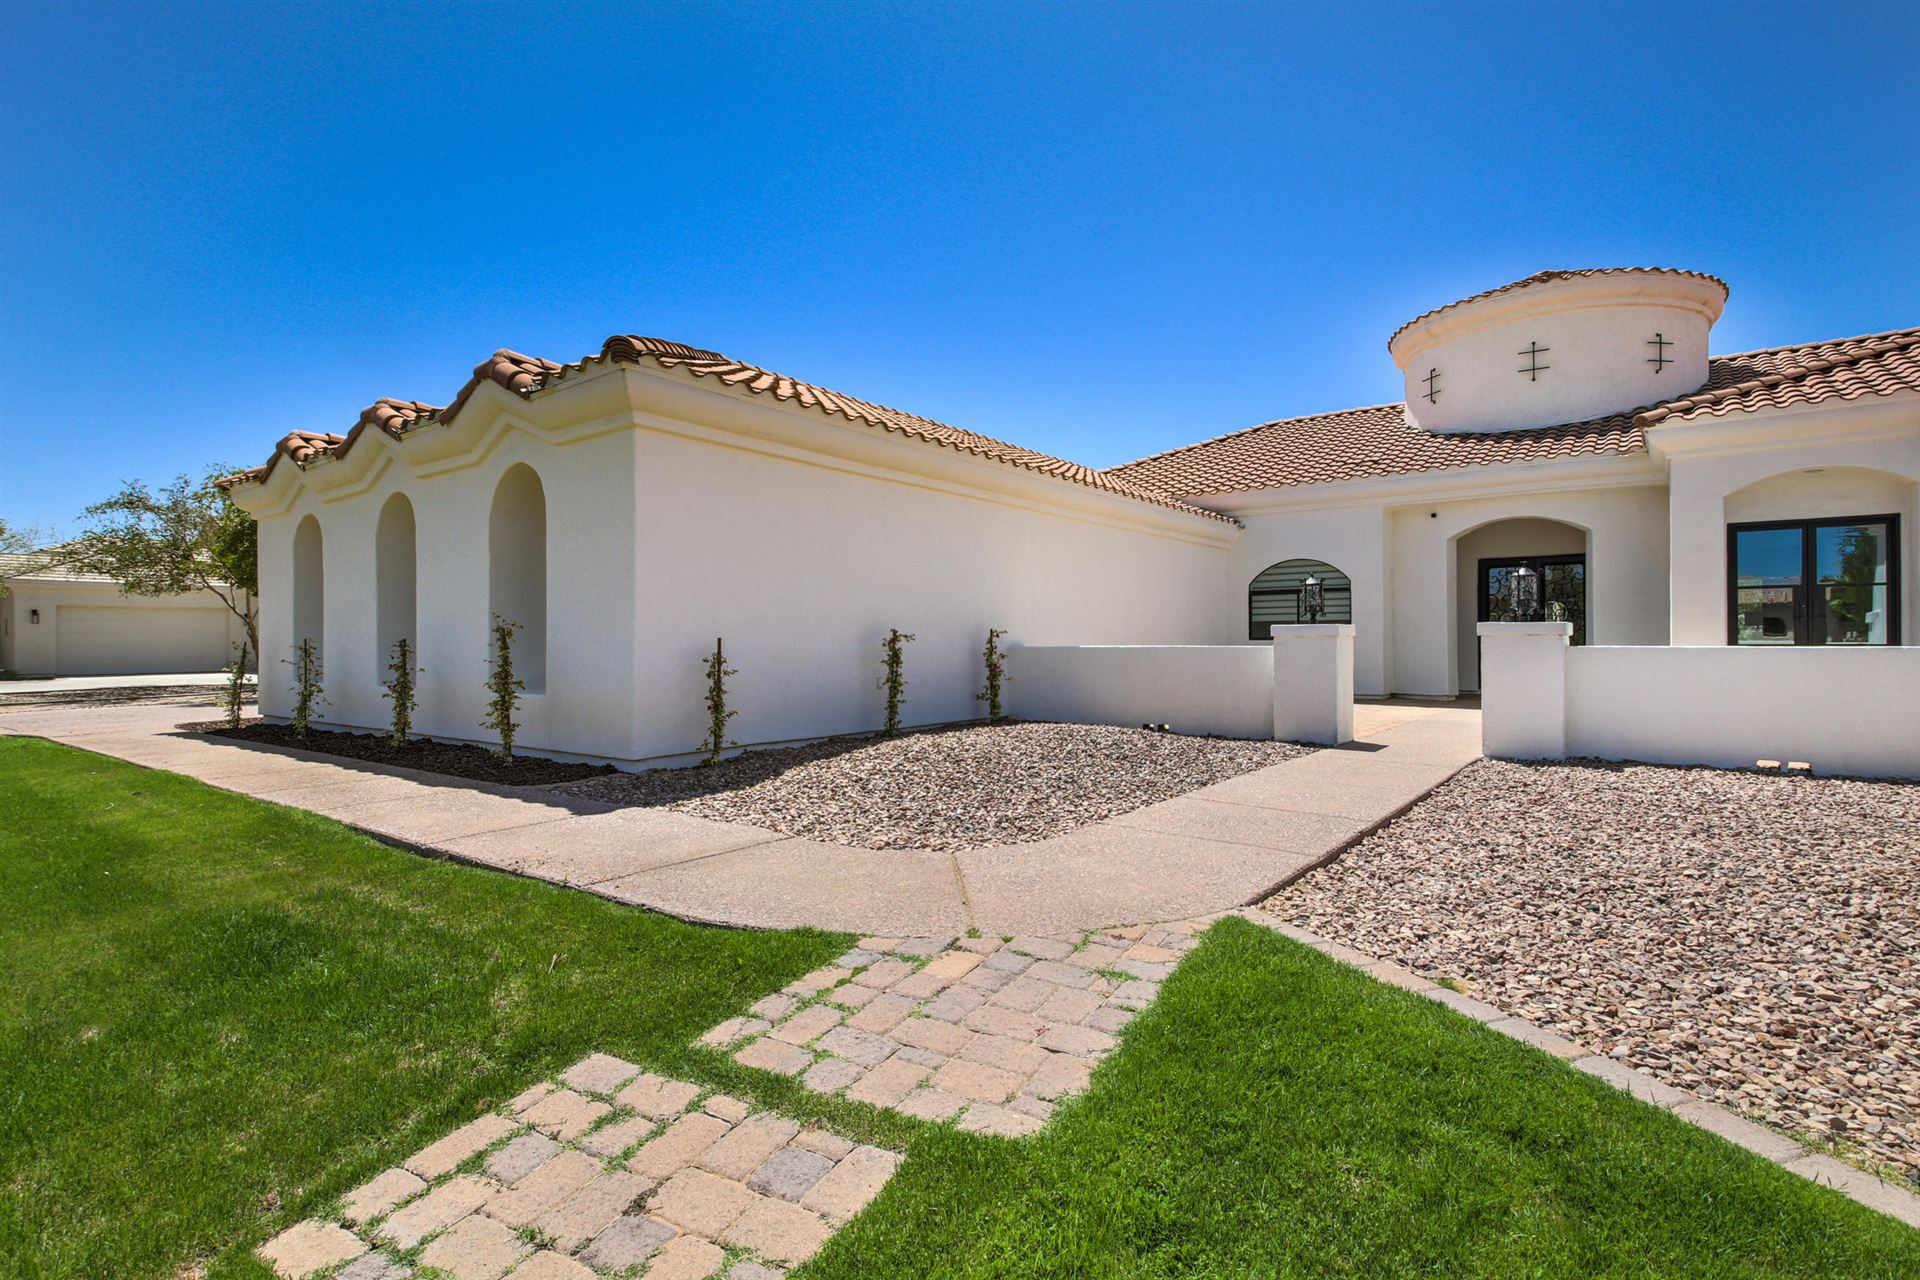 Photo of 19097 E VALLEJO Street, Queen Creek, AZ 85142 (MLS # 6227321)